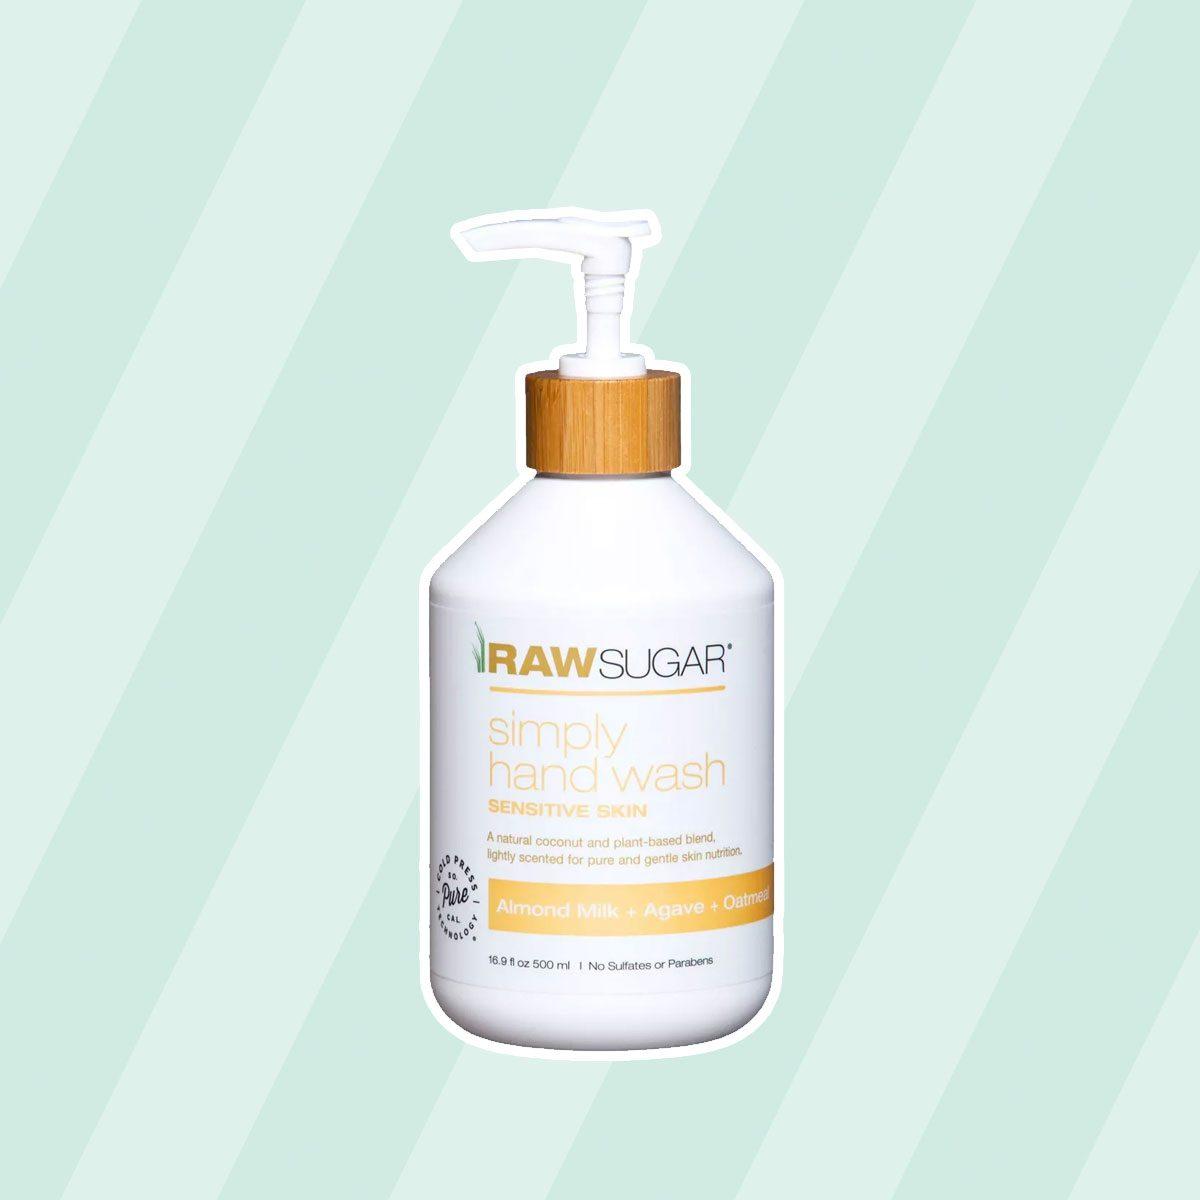 Raw Sugar Sensitive Skin Almond Milk + Agave + Oatmeal Soap